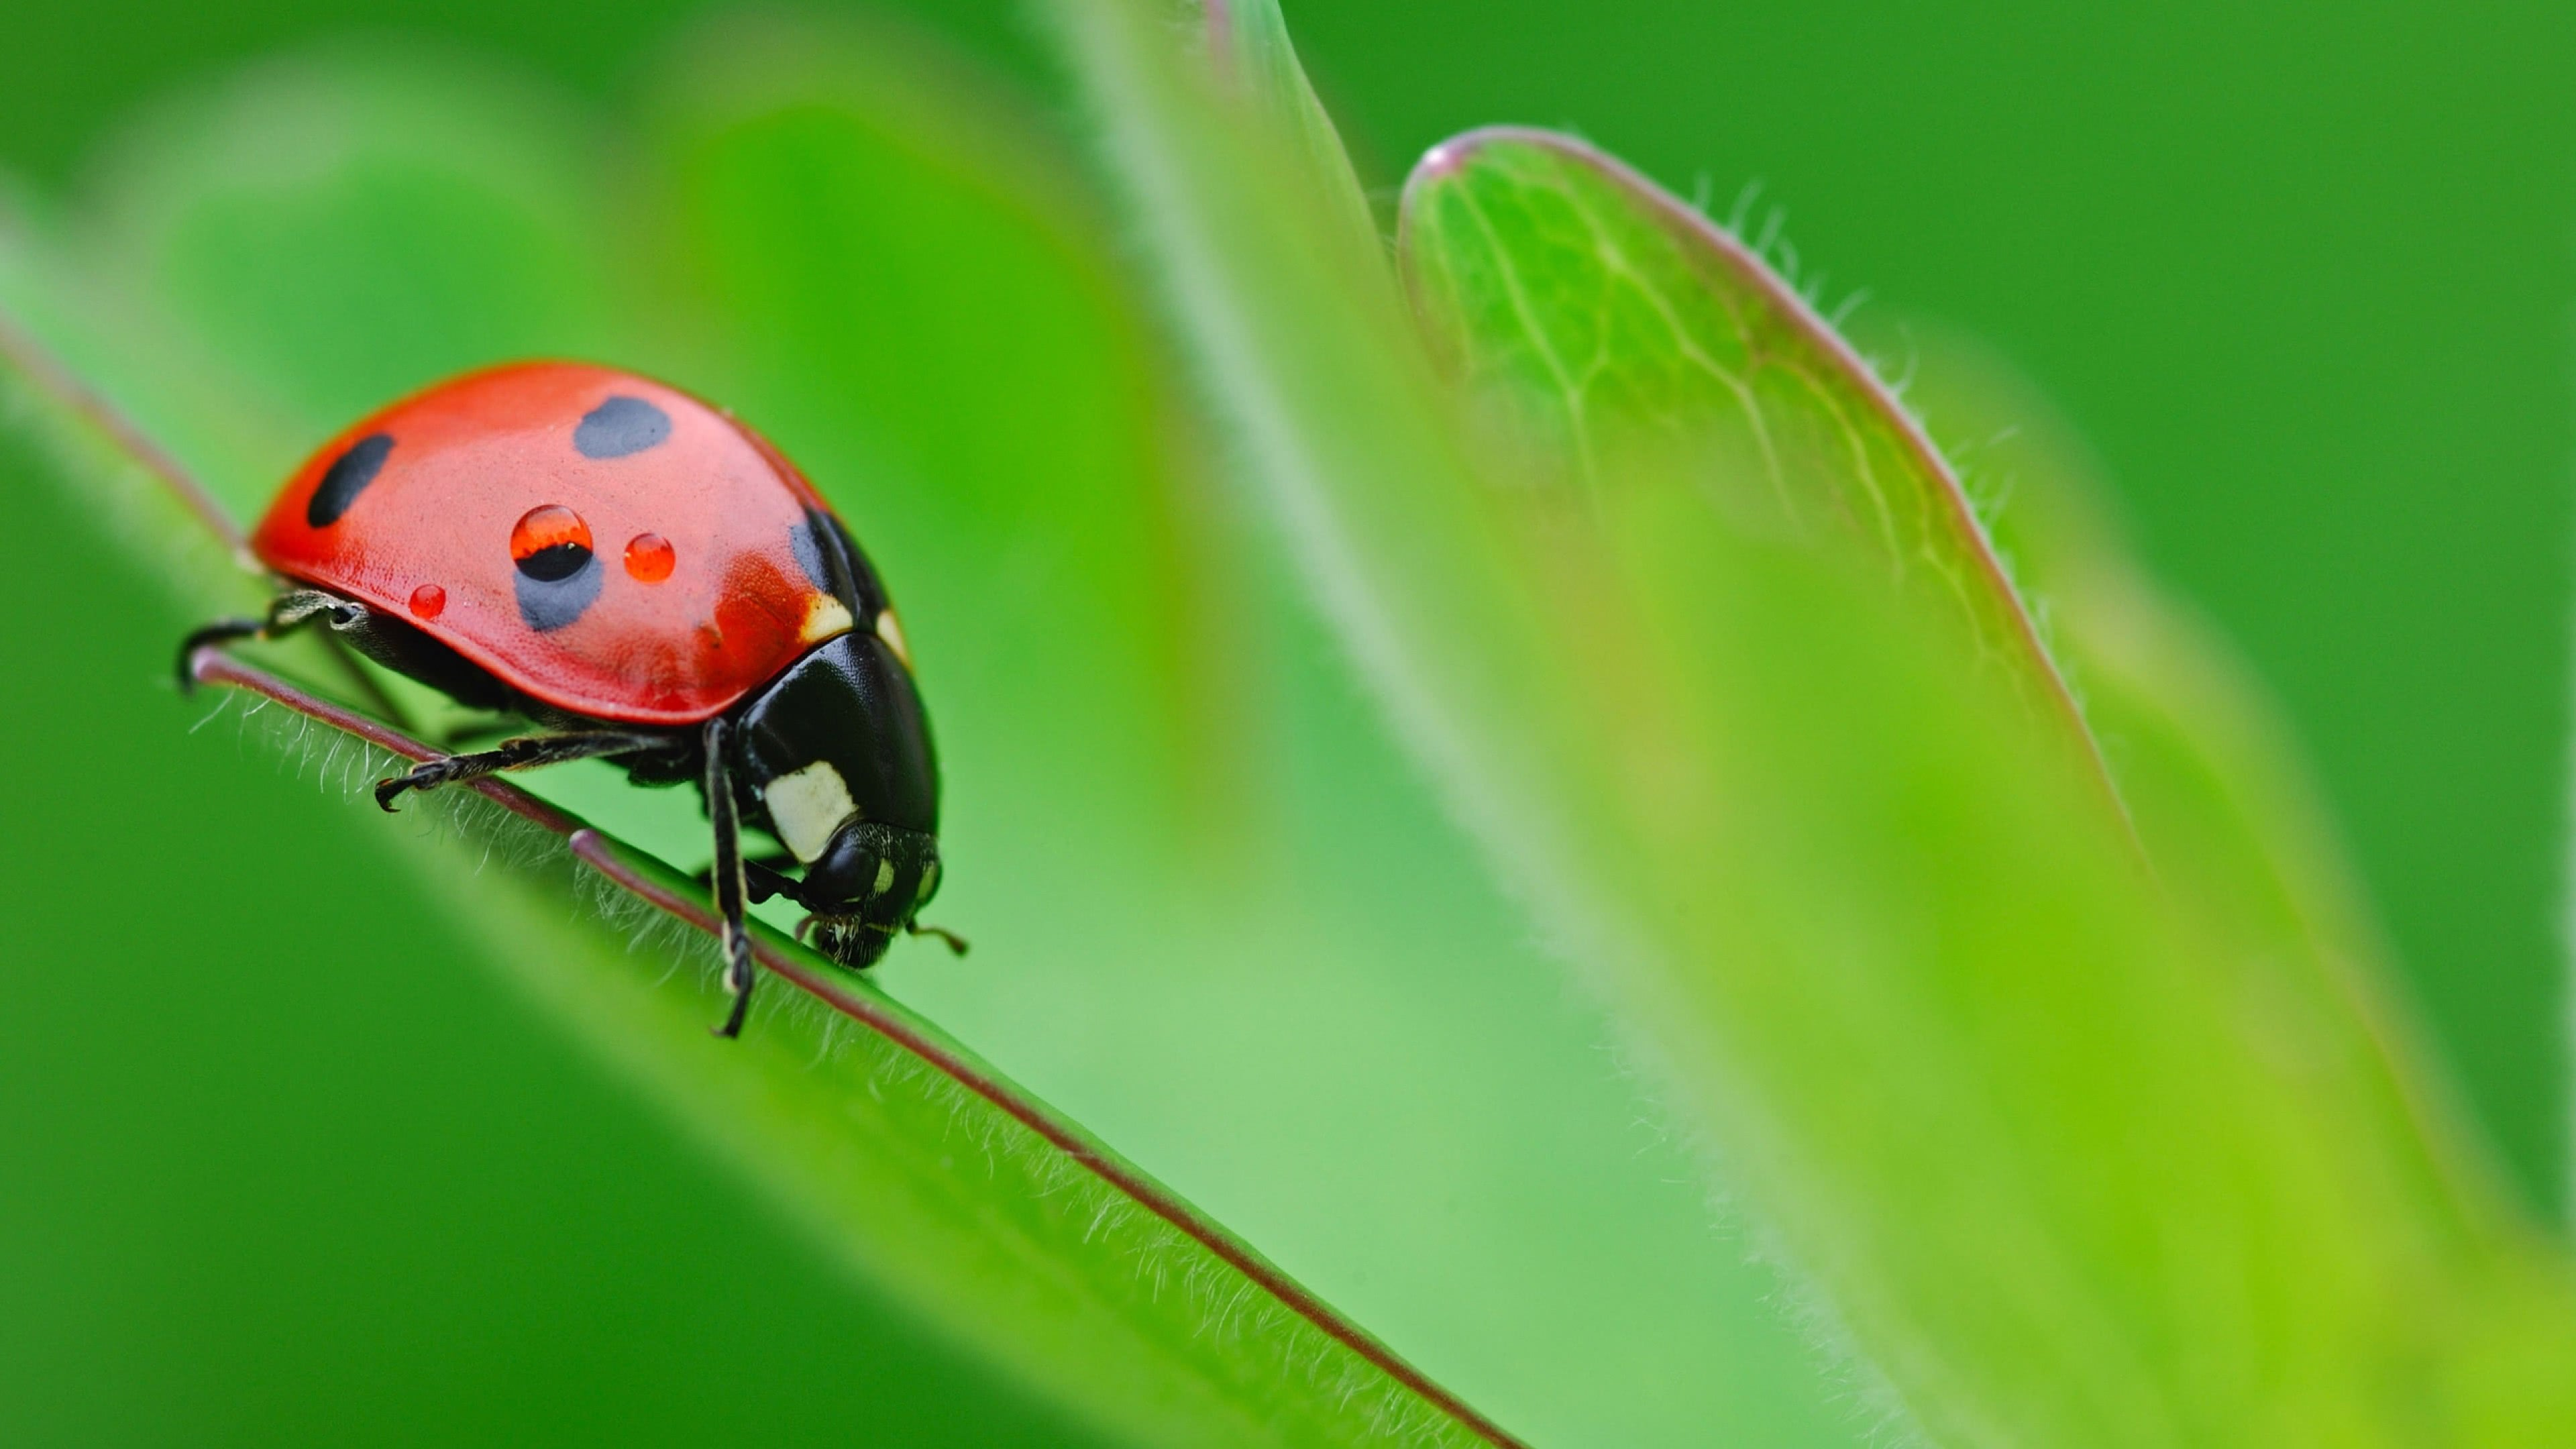 ladybug uhd 4k wallpaper